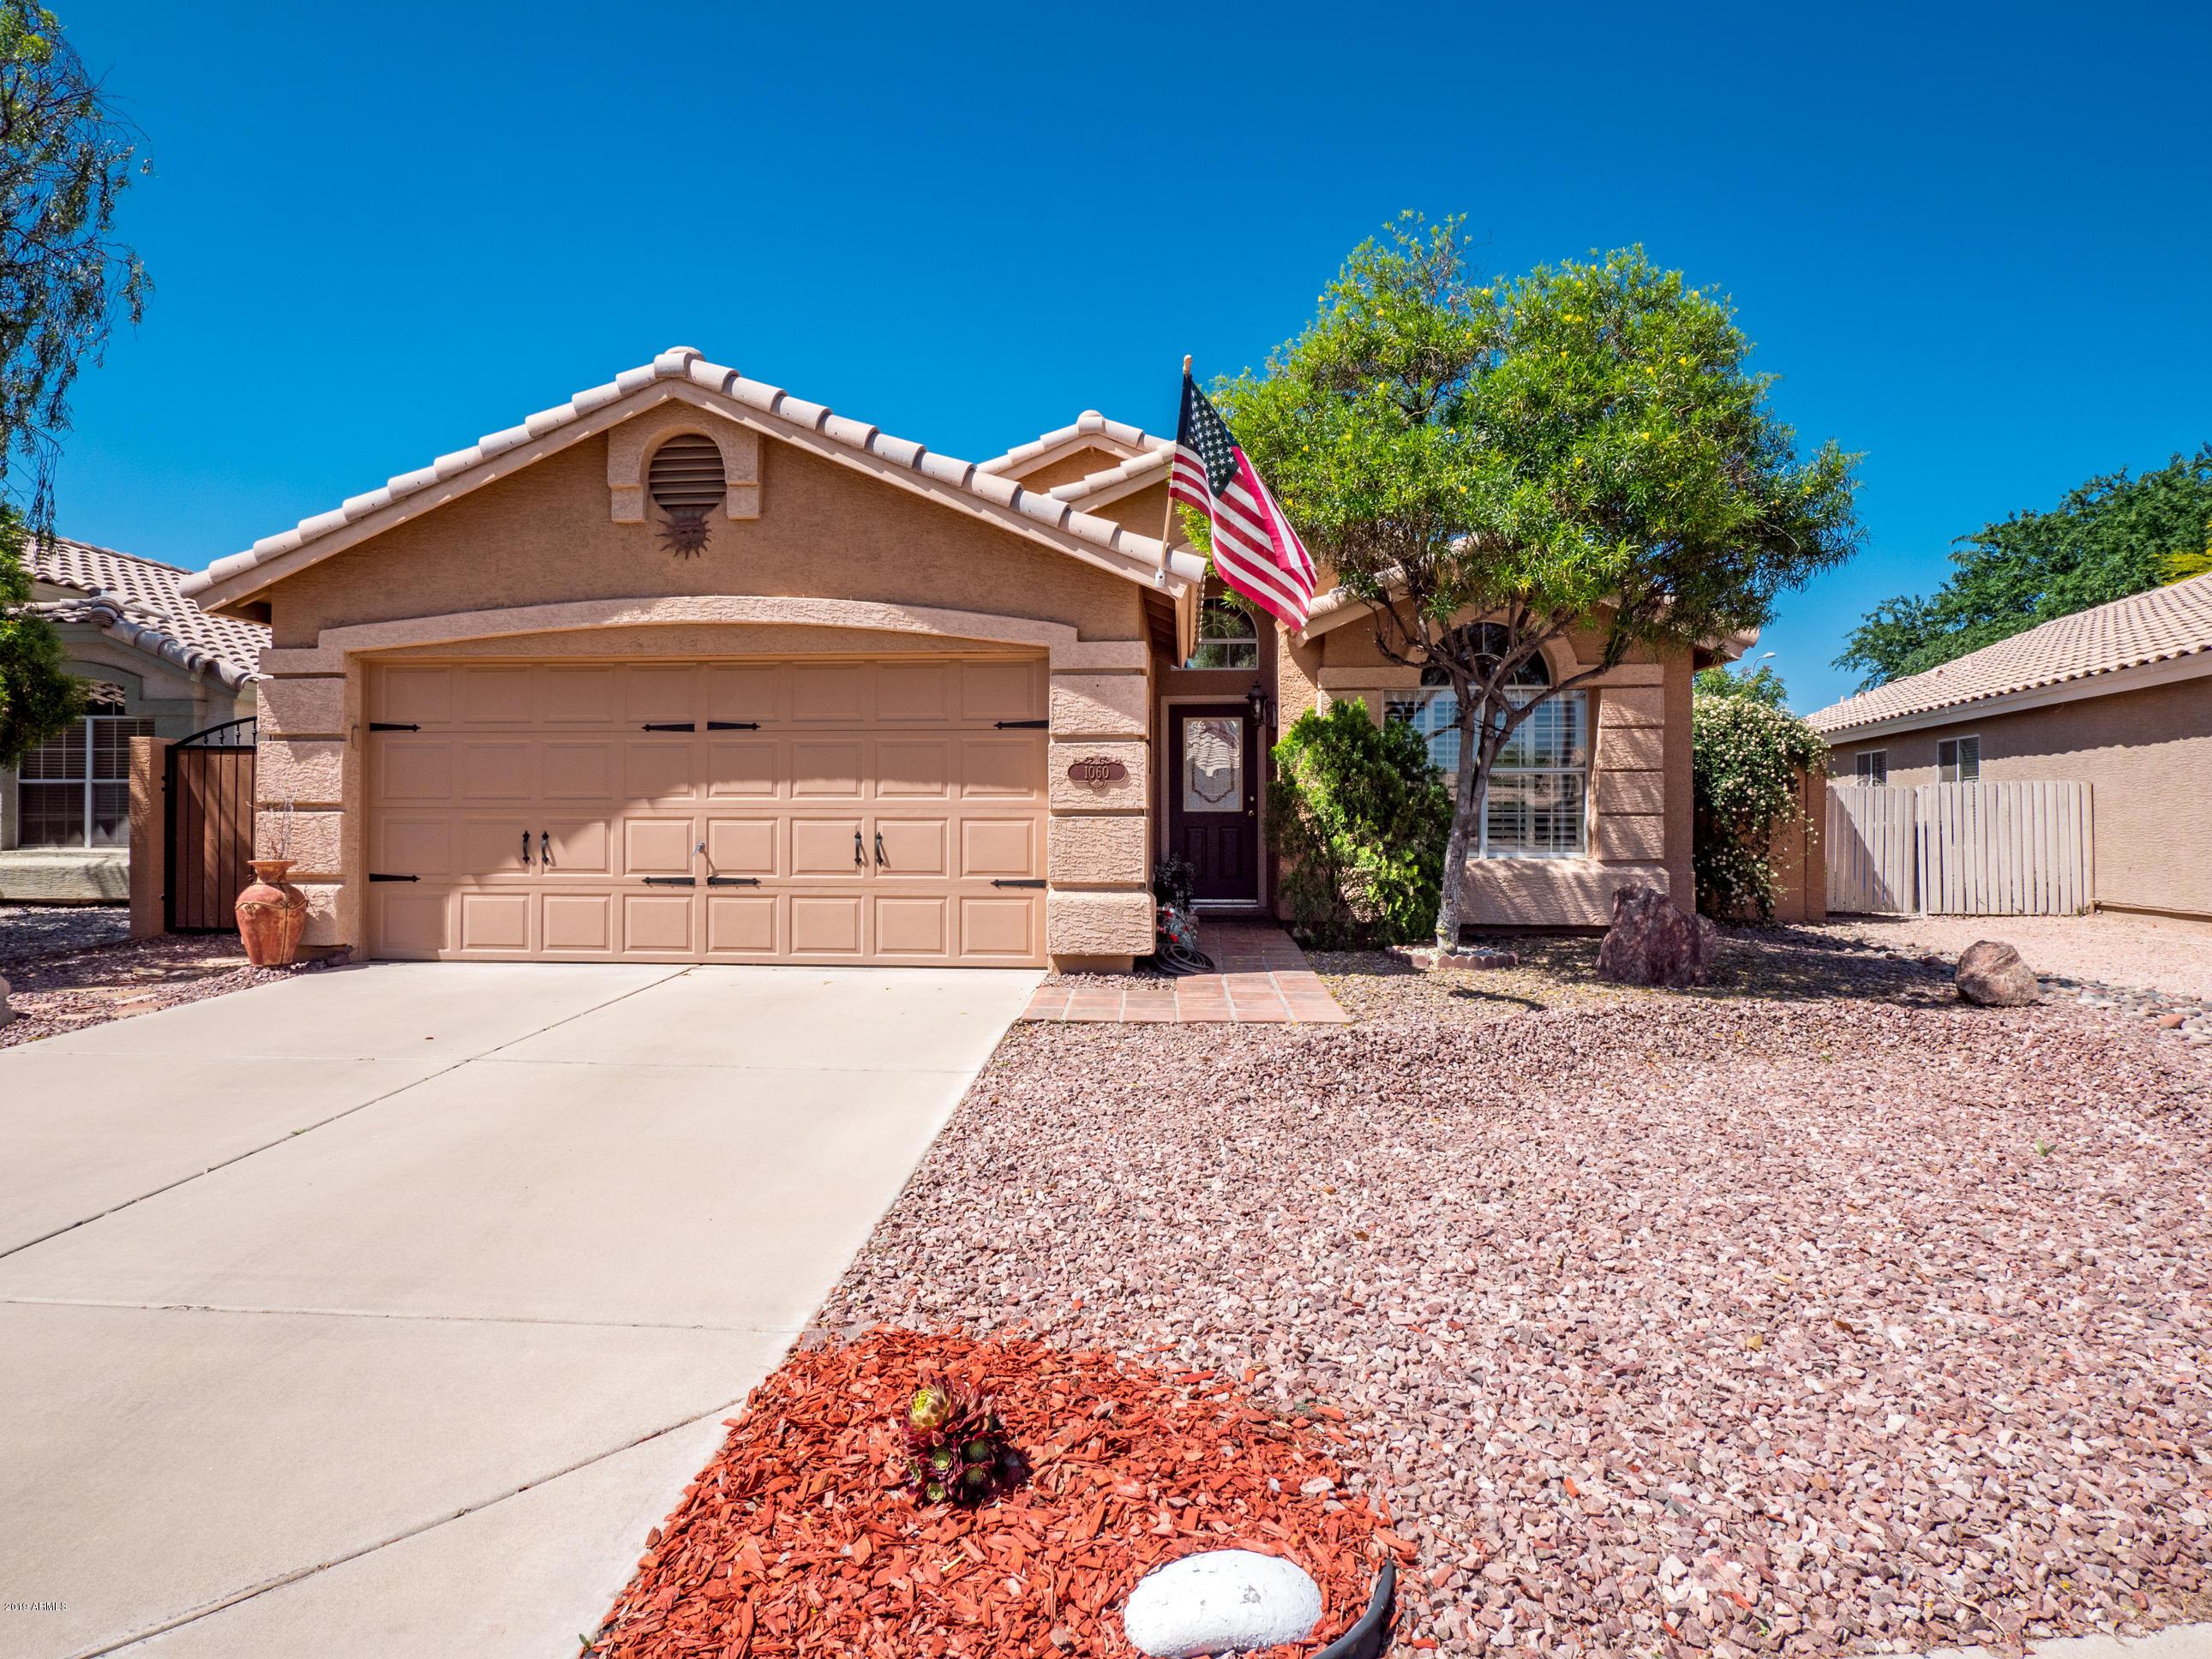 Photo of 1060 N ROBINS Way, Chandler, AZ 85225